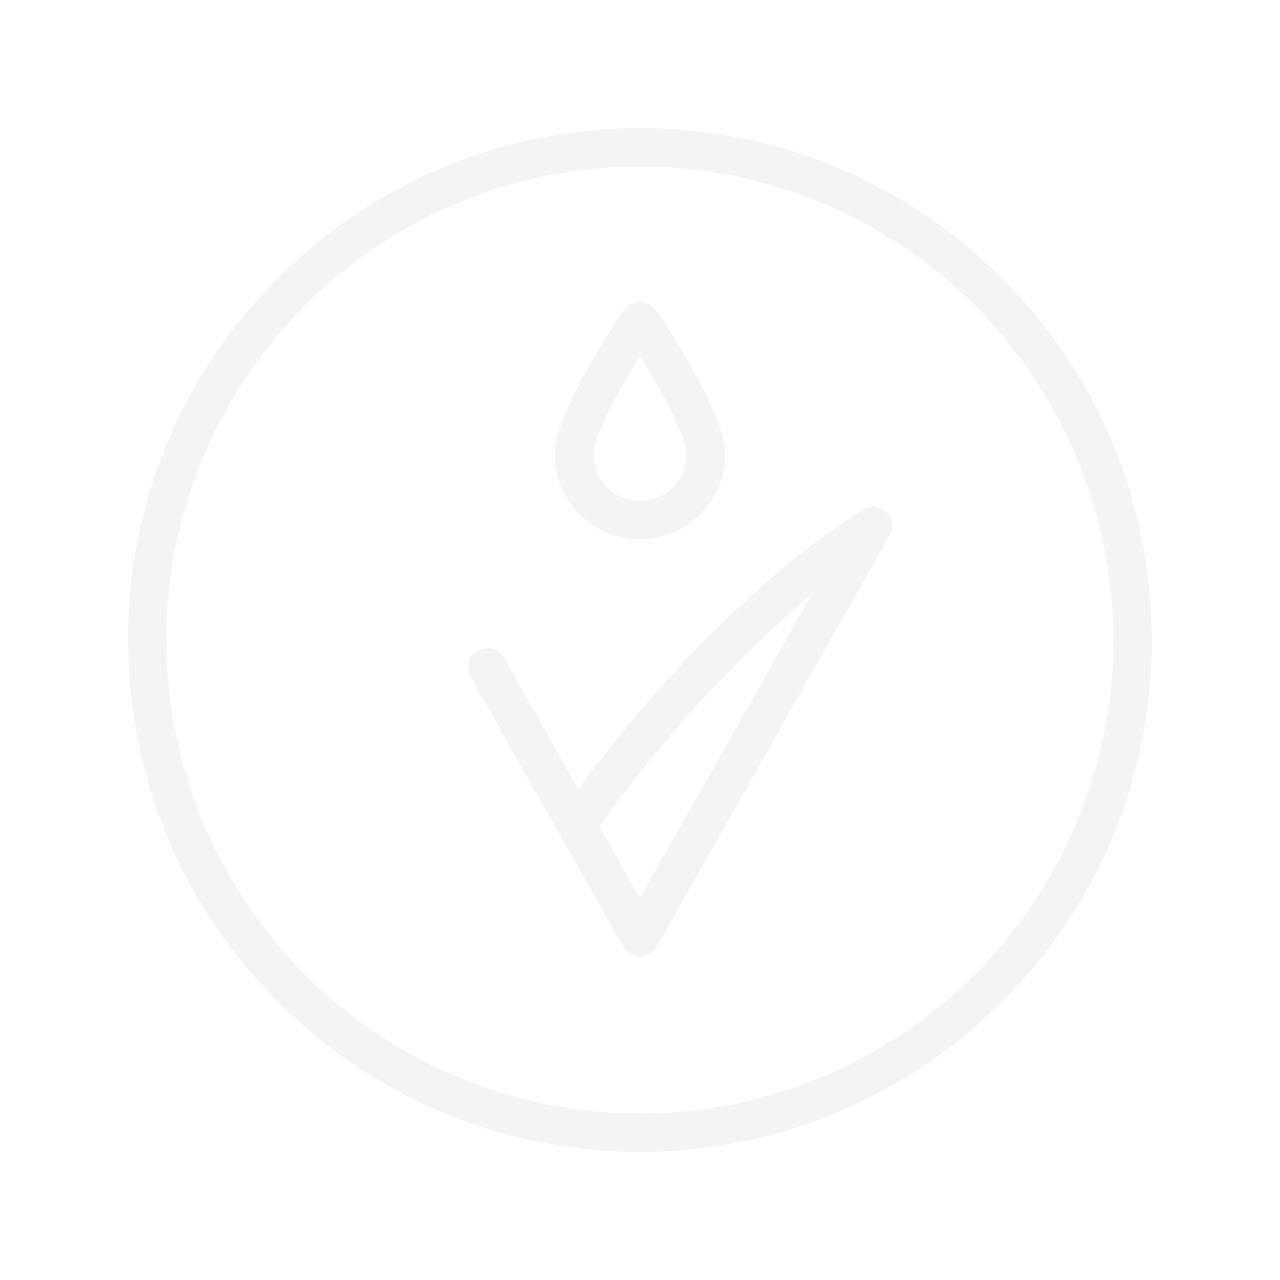 BIOKAP Nutricolor 4.4 Auburn Brown Permanent Hair Dye 140ml